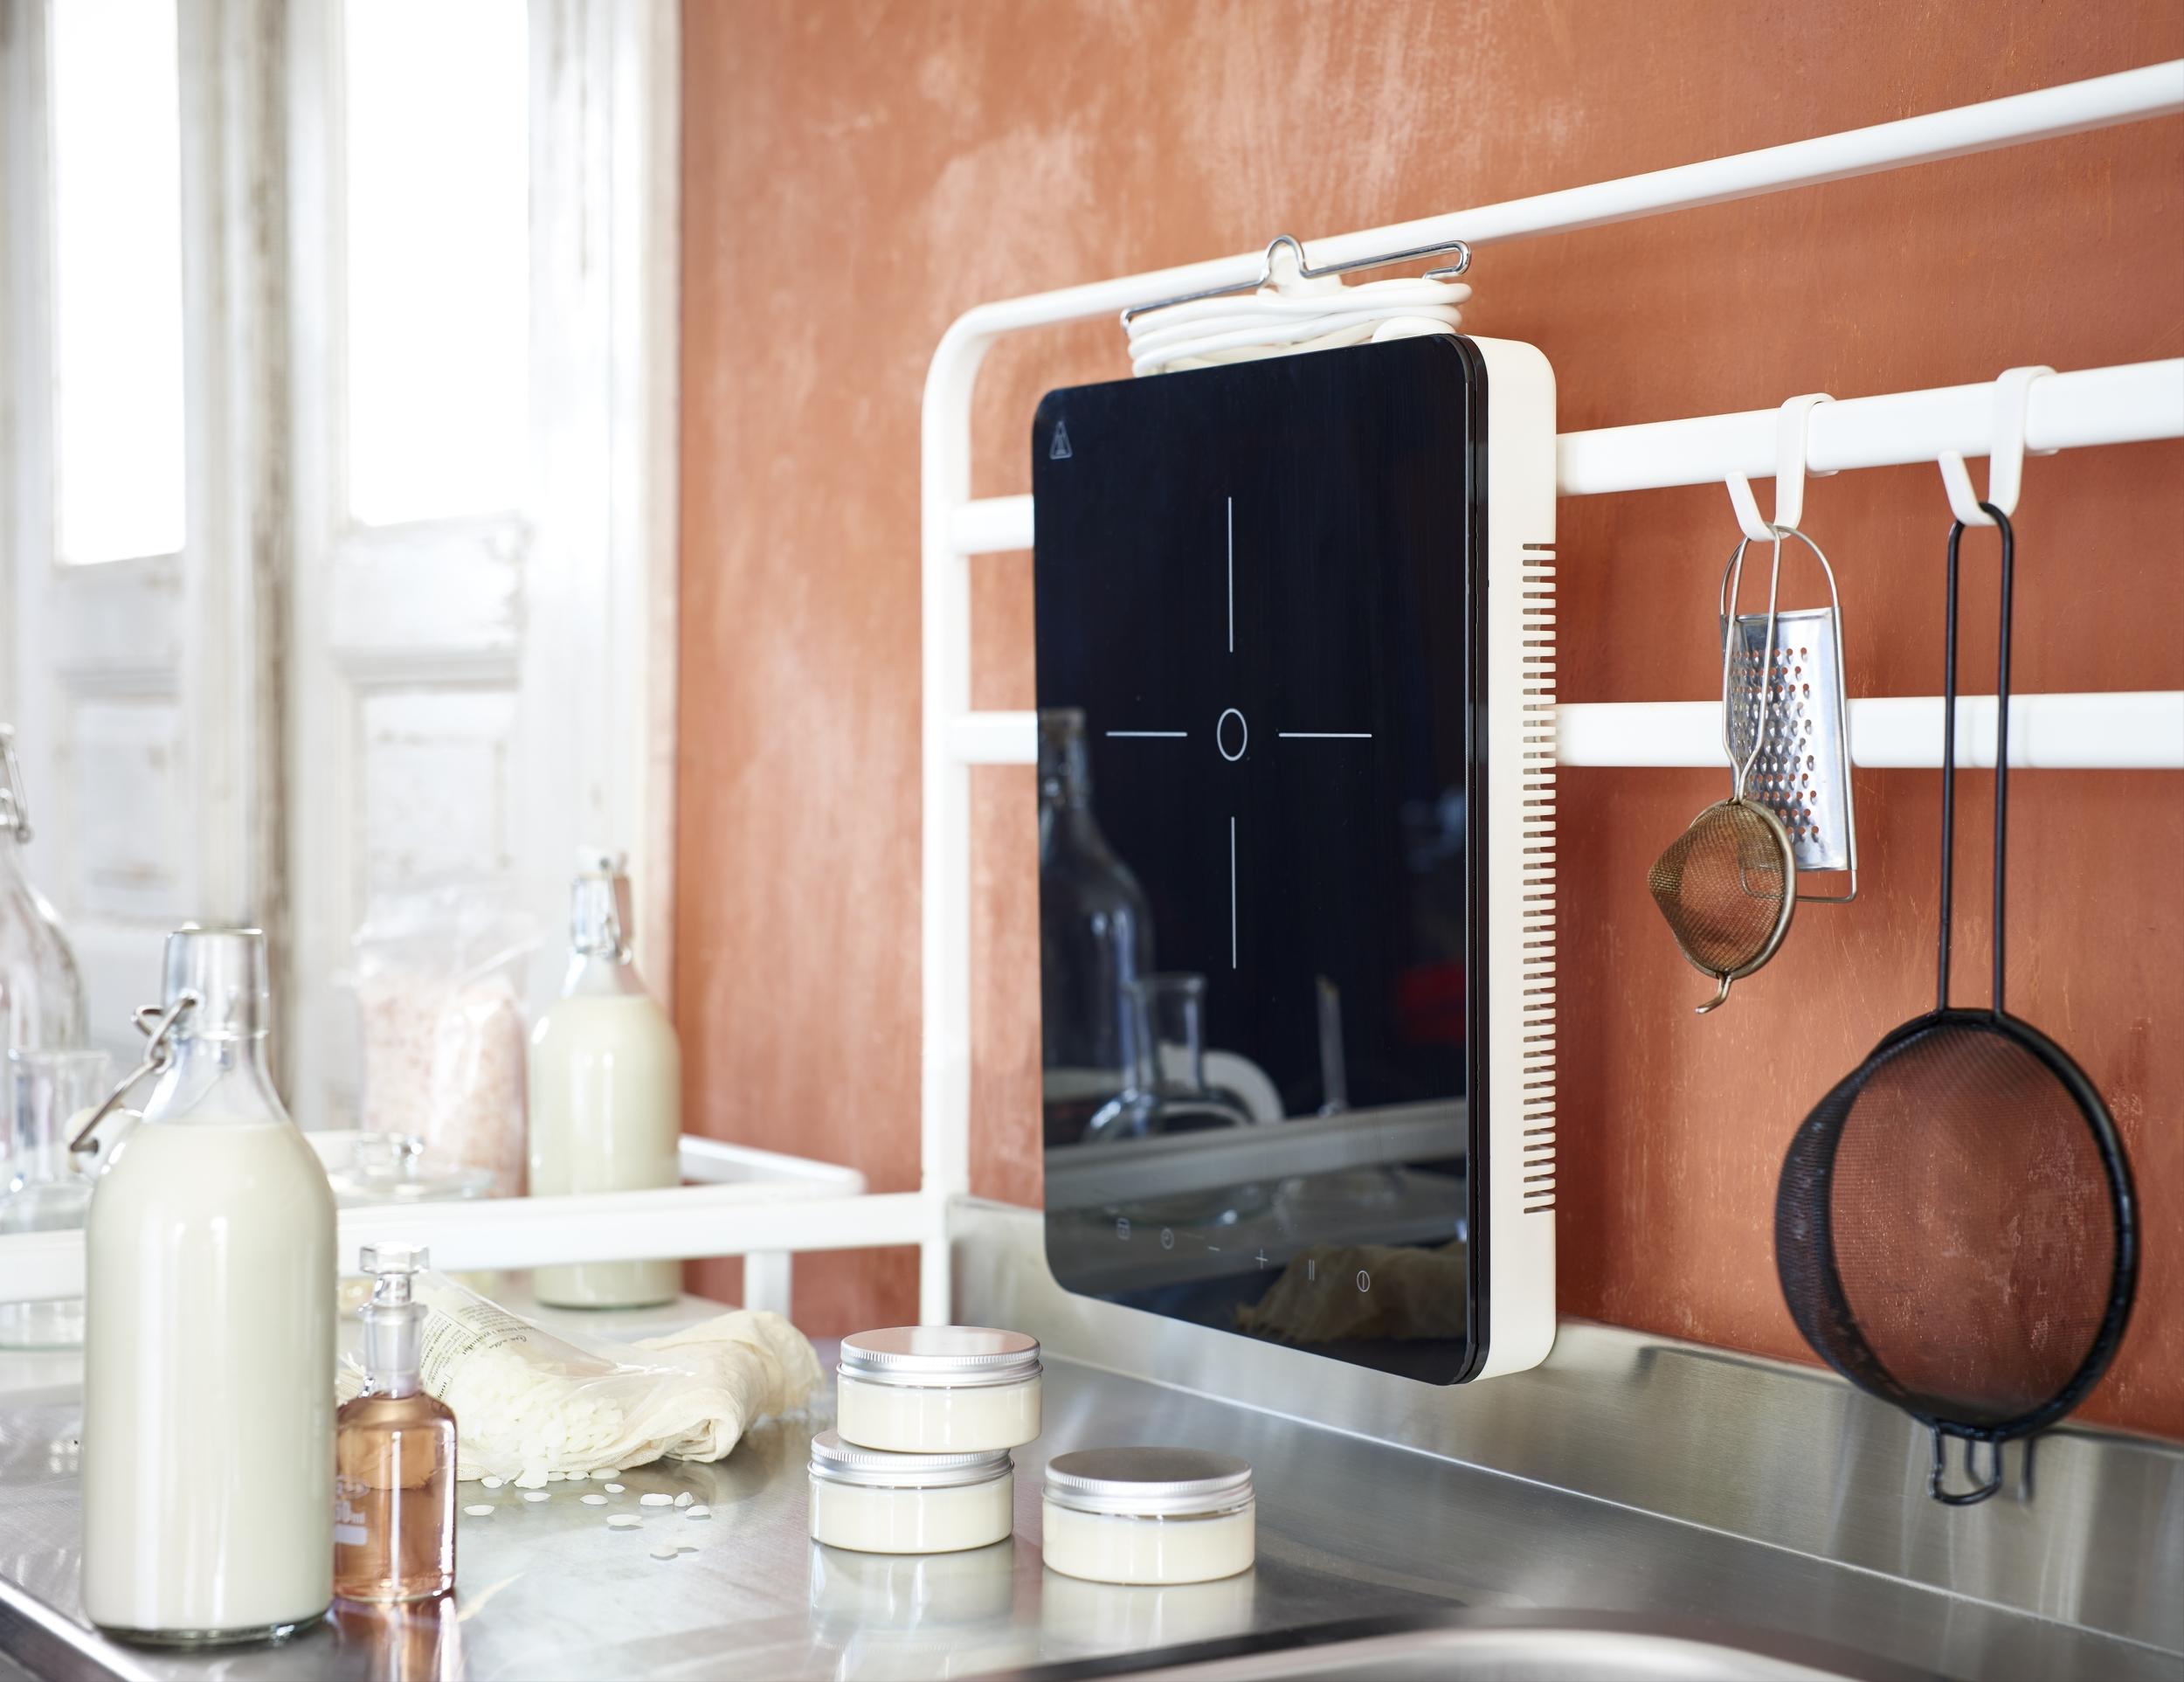 Tillreda - IKEAs new portable induction cooktop.